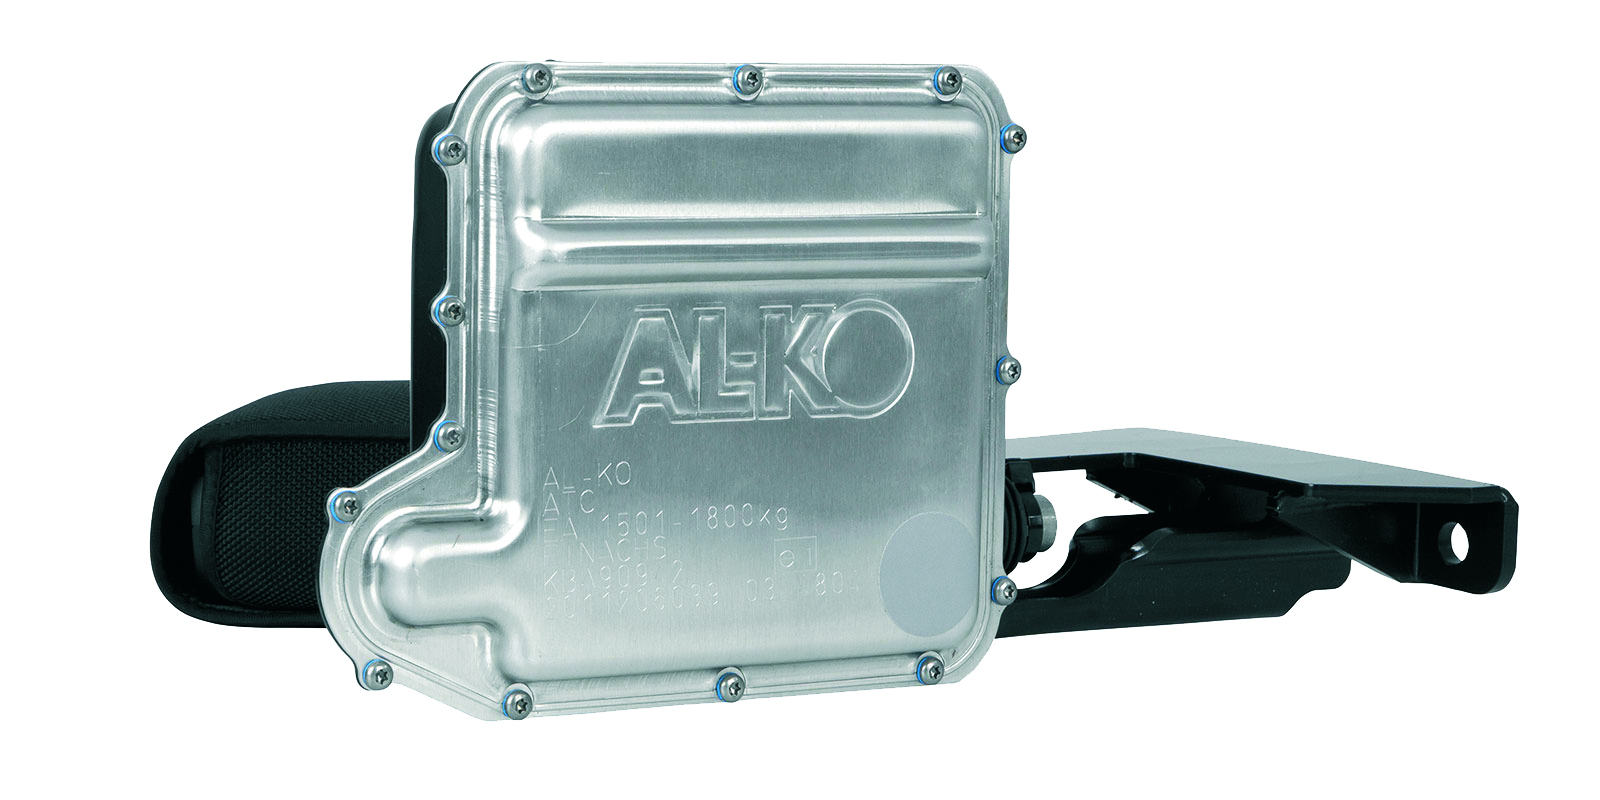 AL-KO trailer control, anti-slinger systeem